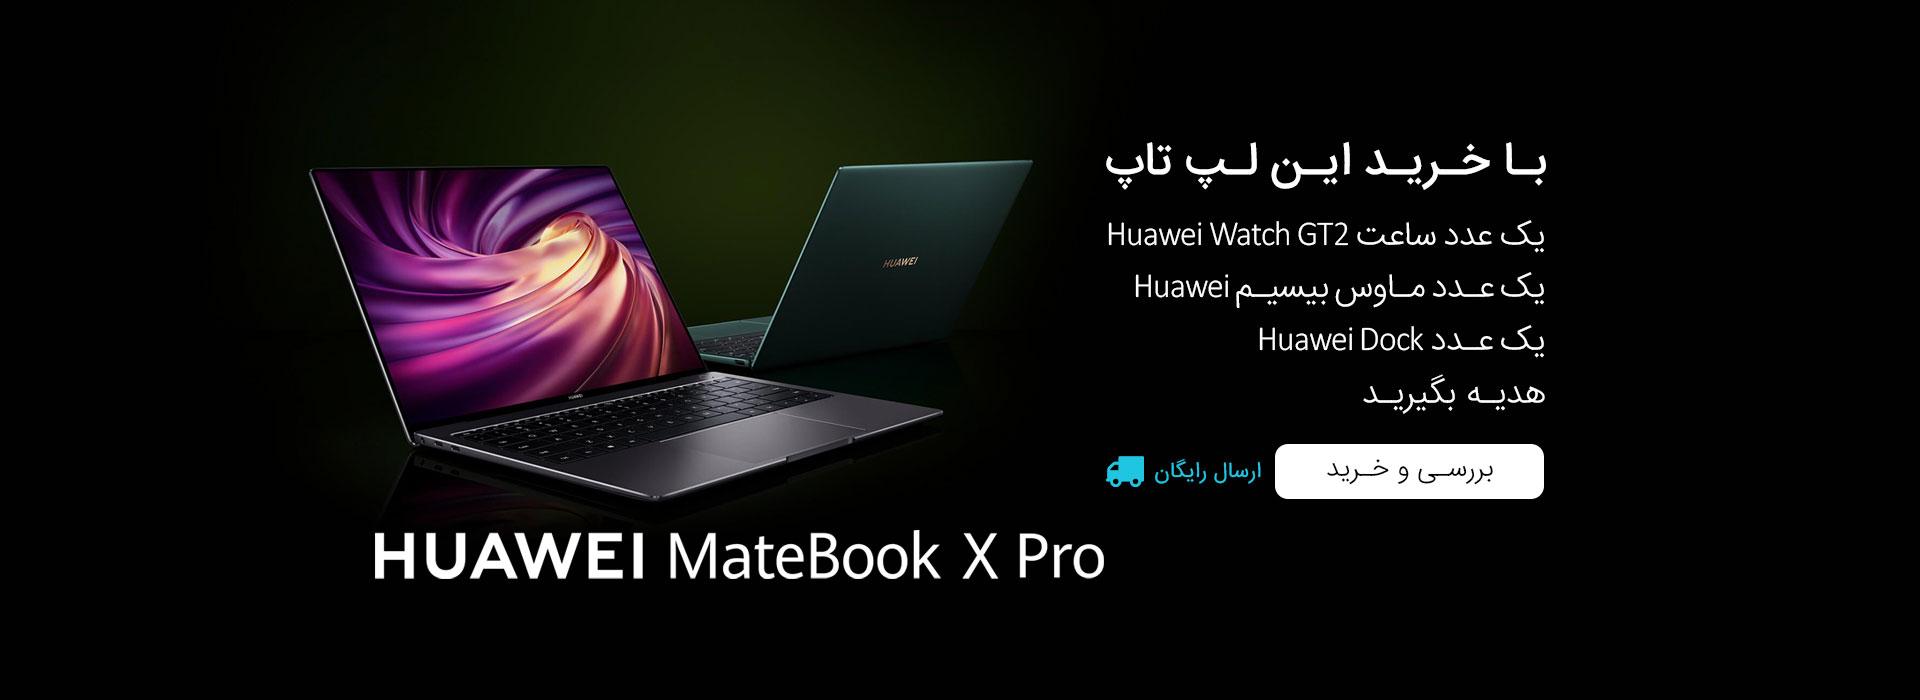 لپ تاپ 13.9 اینچ Huawei مدل MateBook X Pro